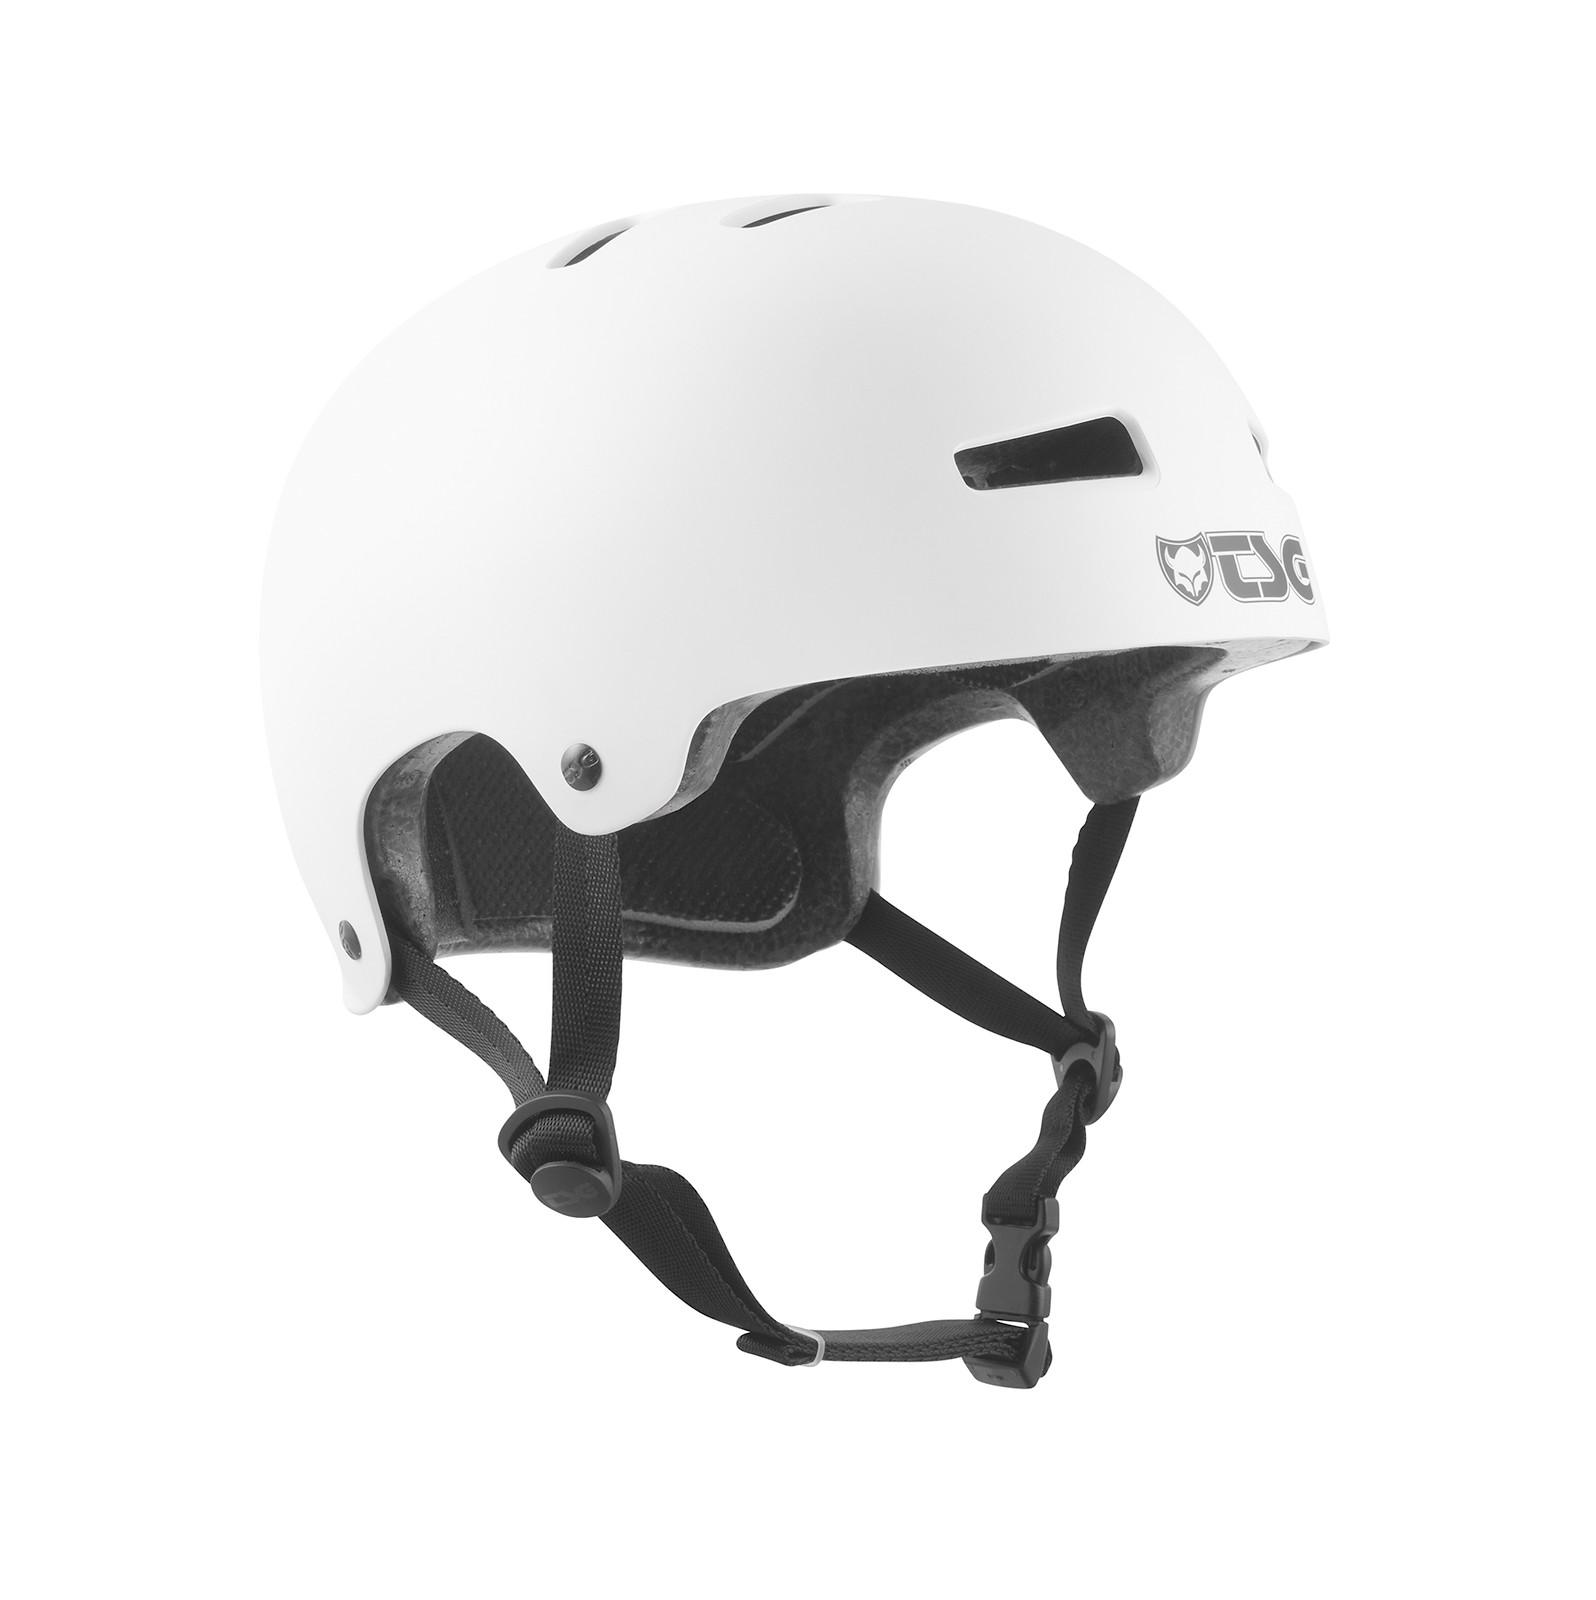 TSG BMX//Dirt Helm Evolution Injected Color Injected Black